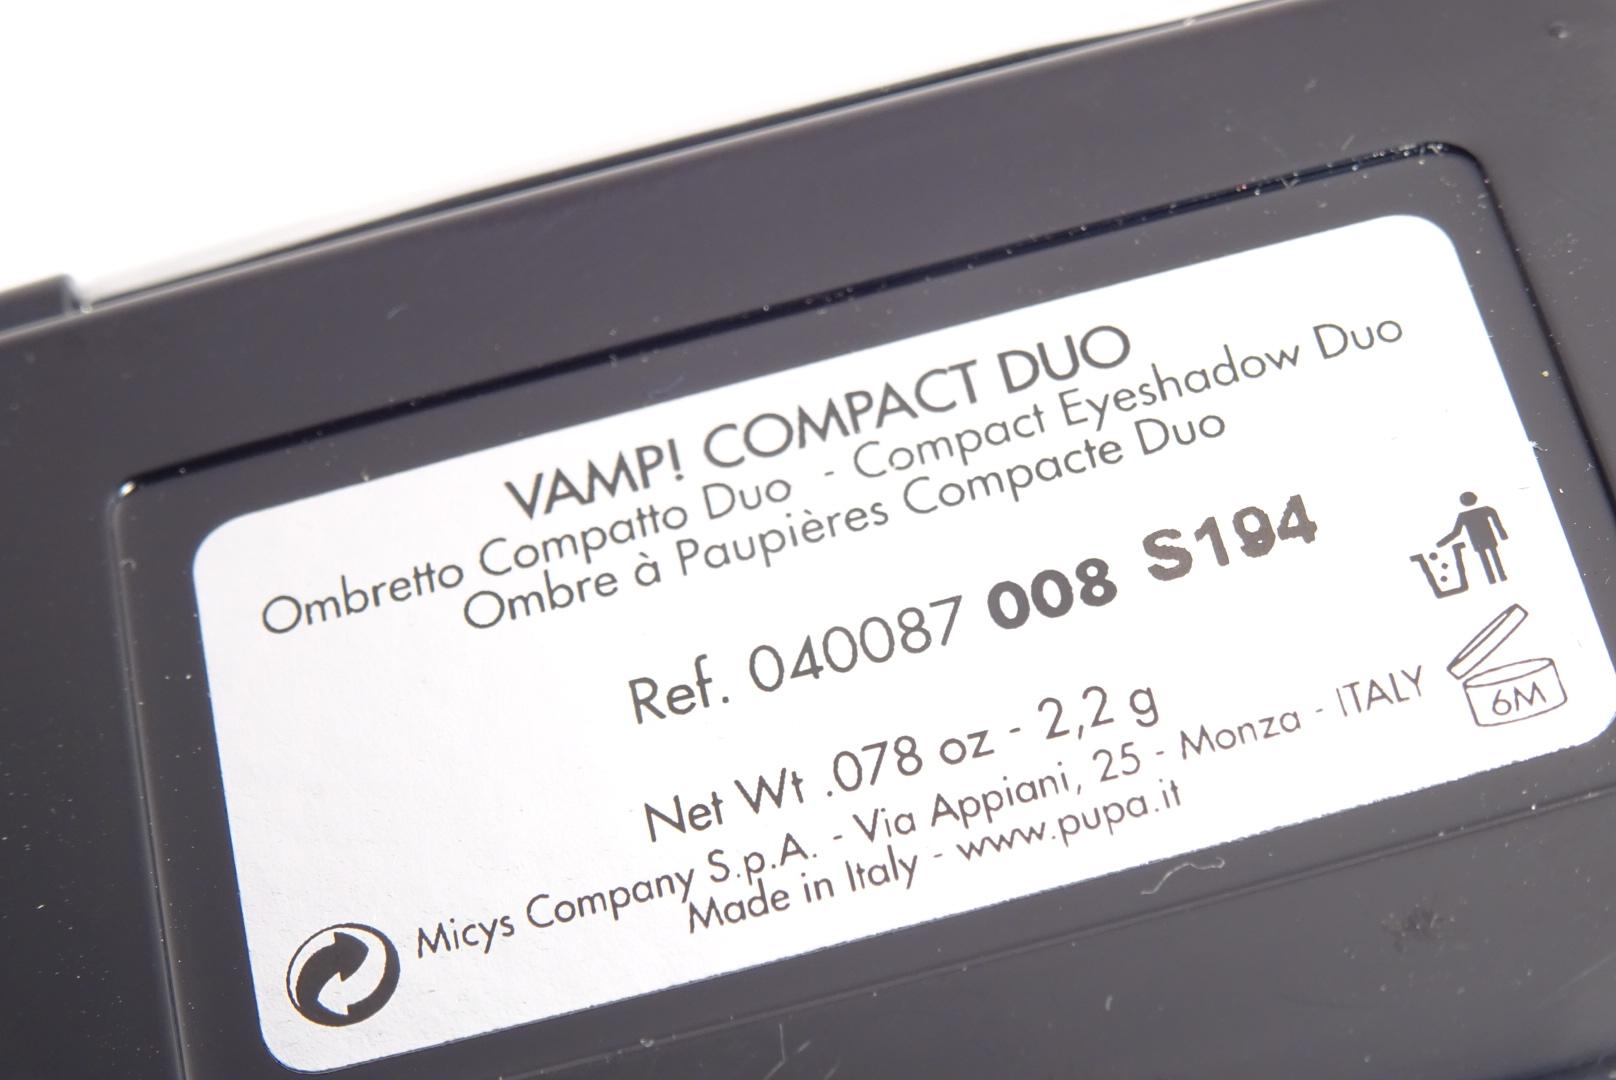 pupa_vamp_compact_duo_008_1.JPG